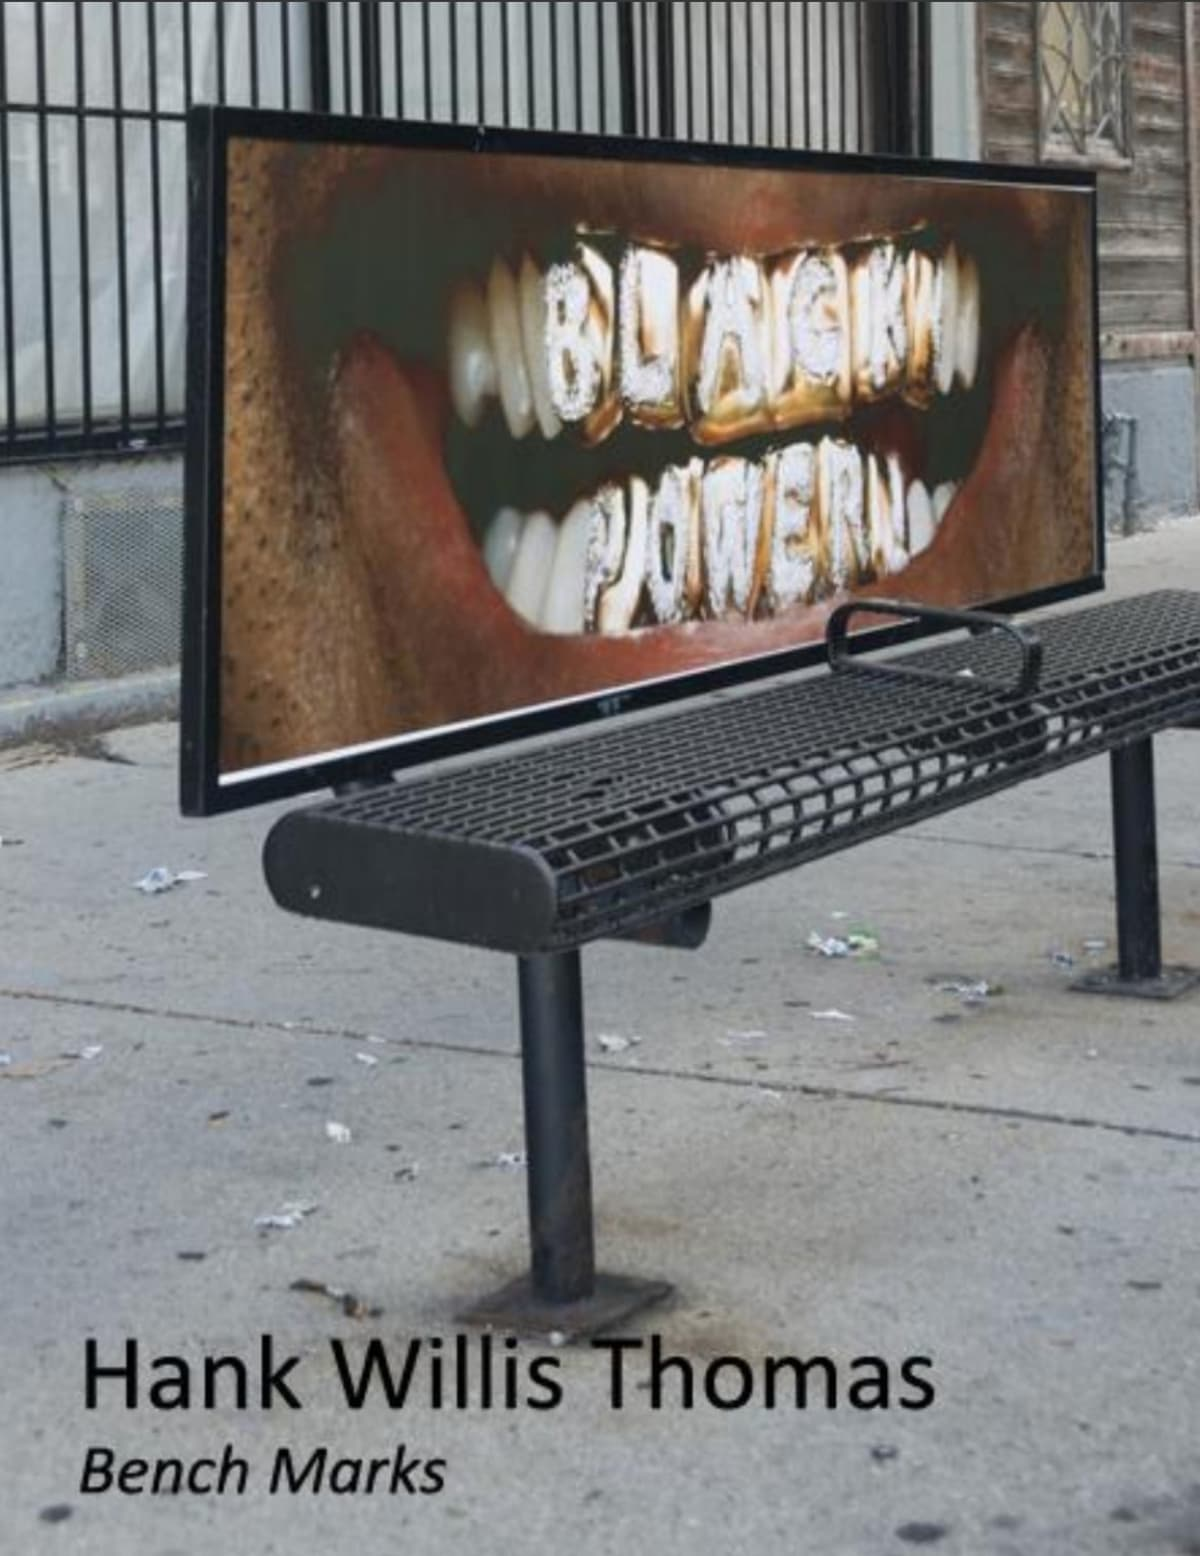 Hank Willis Thomas: Bench Marks